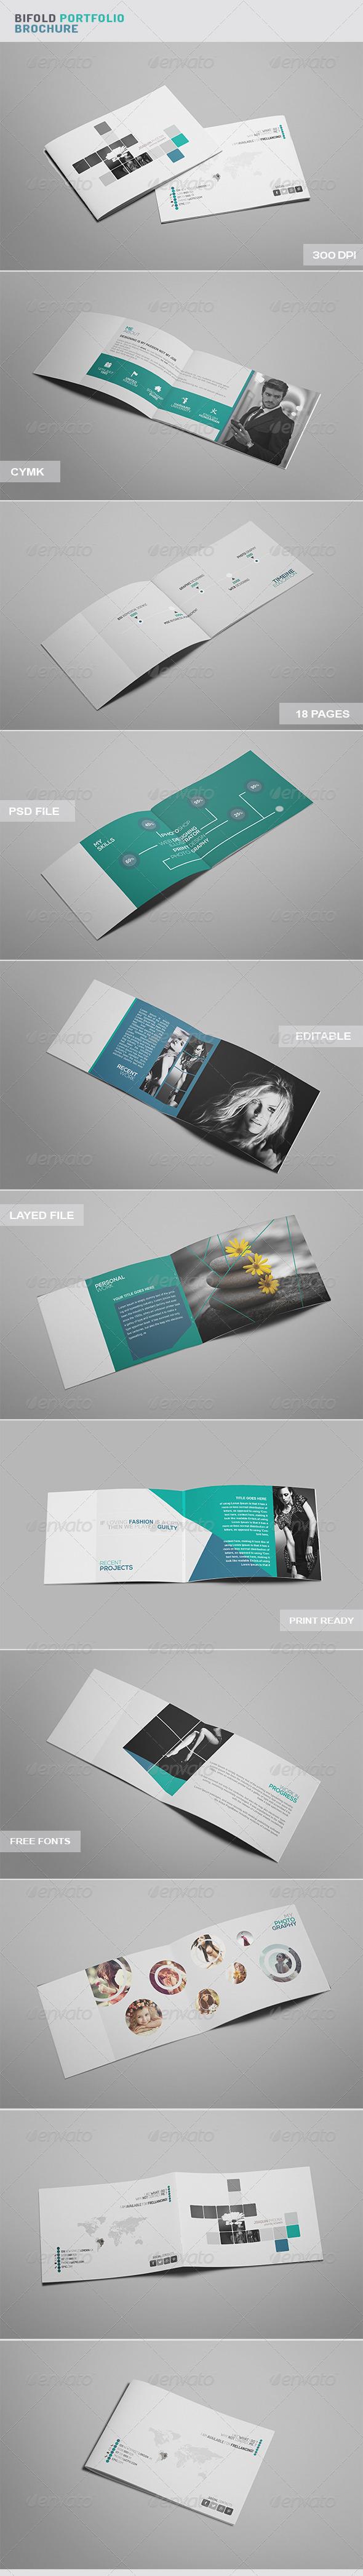 GraphicRiver Bi Fold Portfolio Brochure 8210292